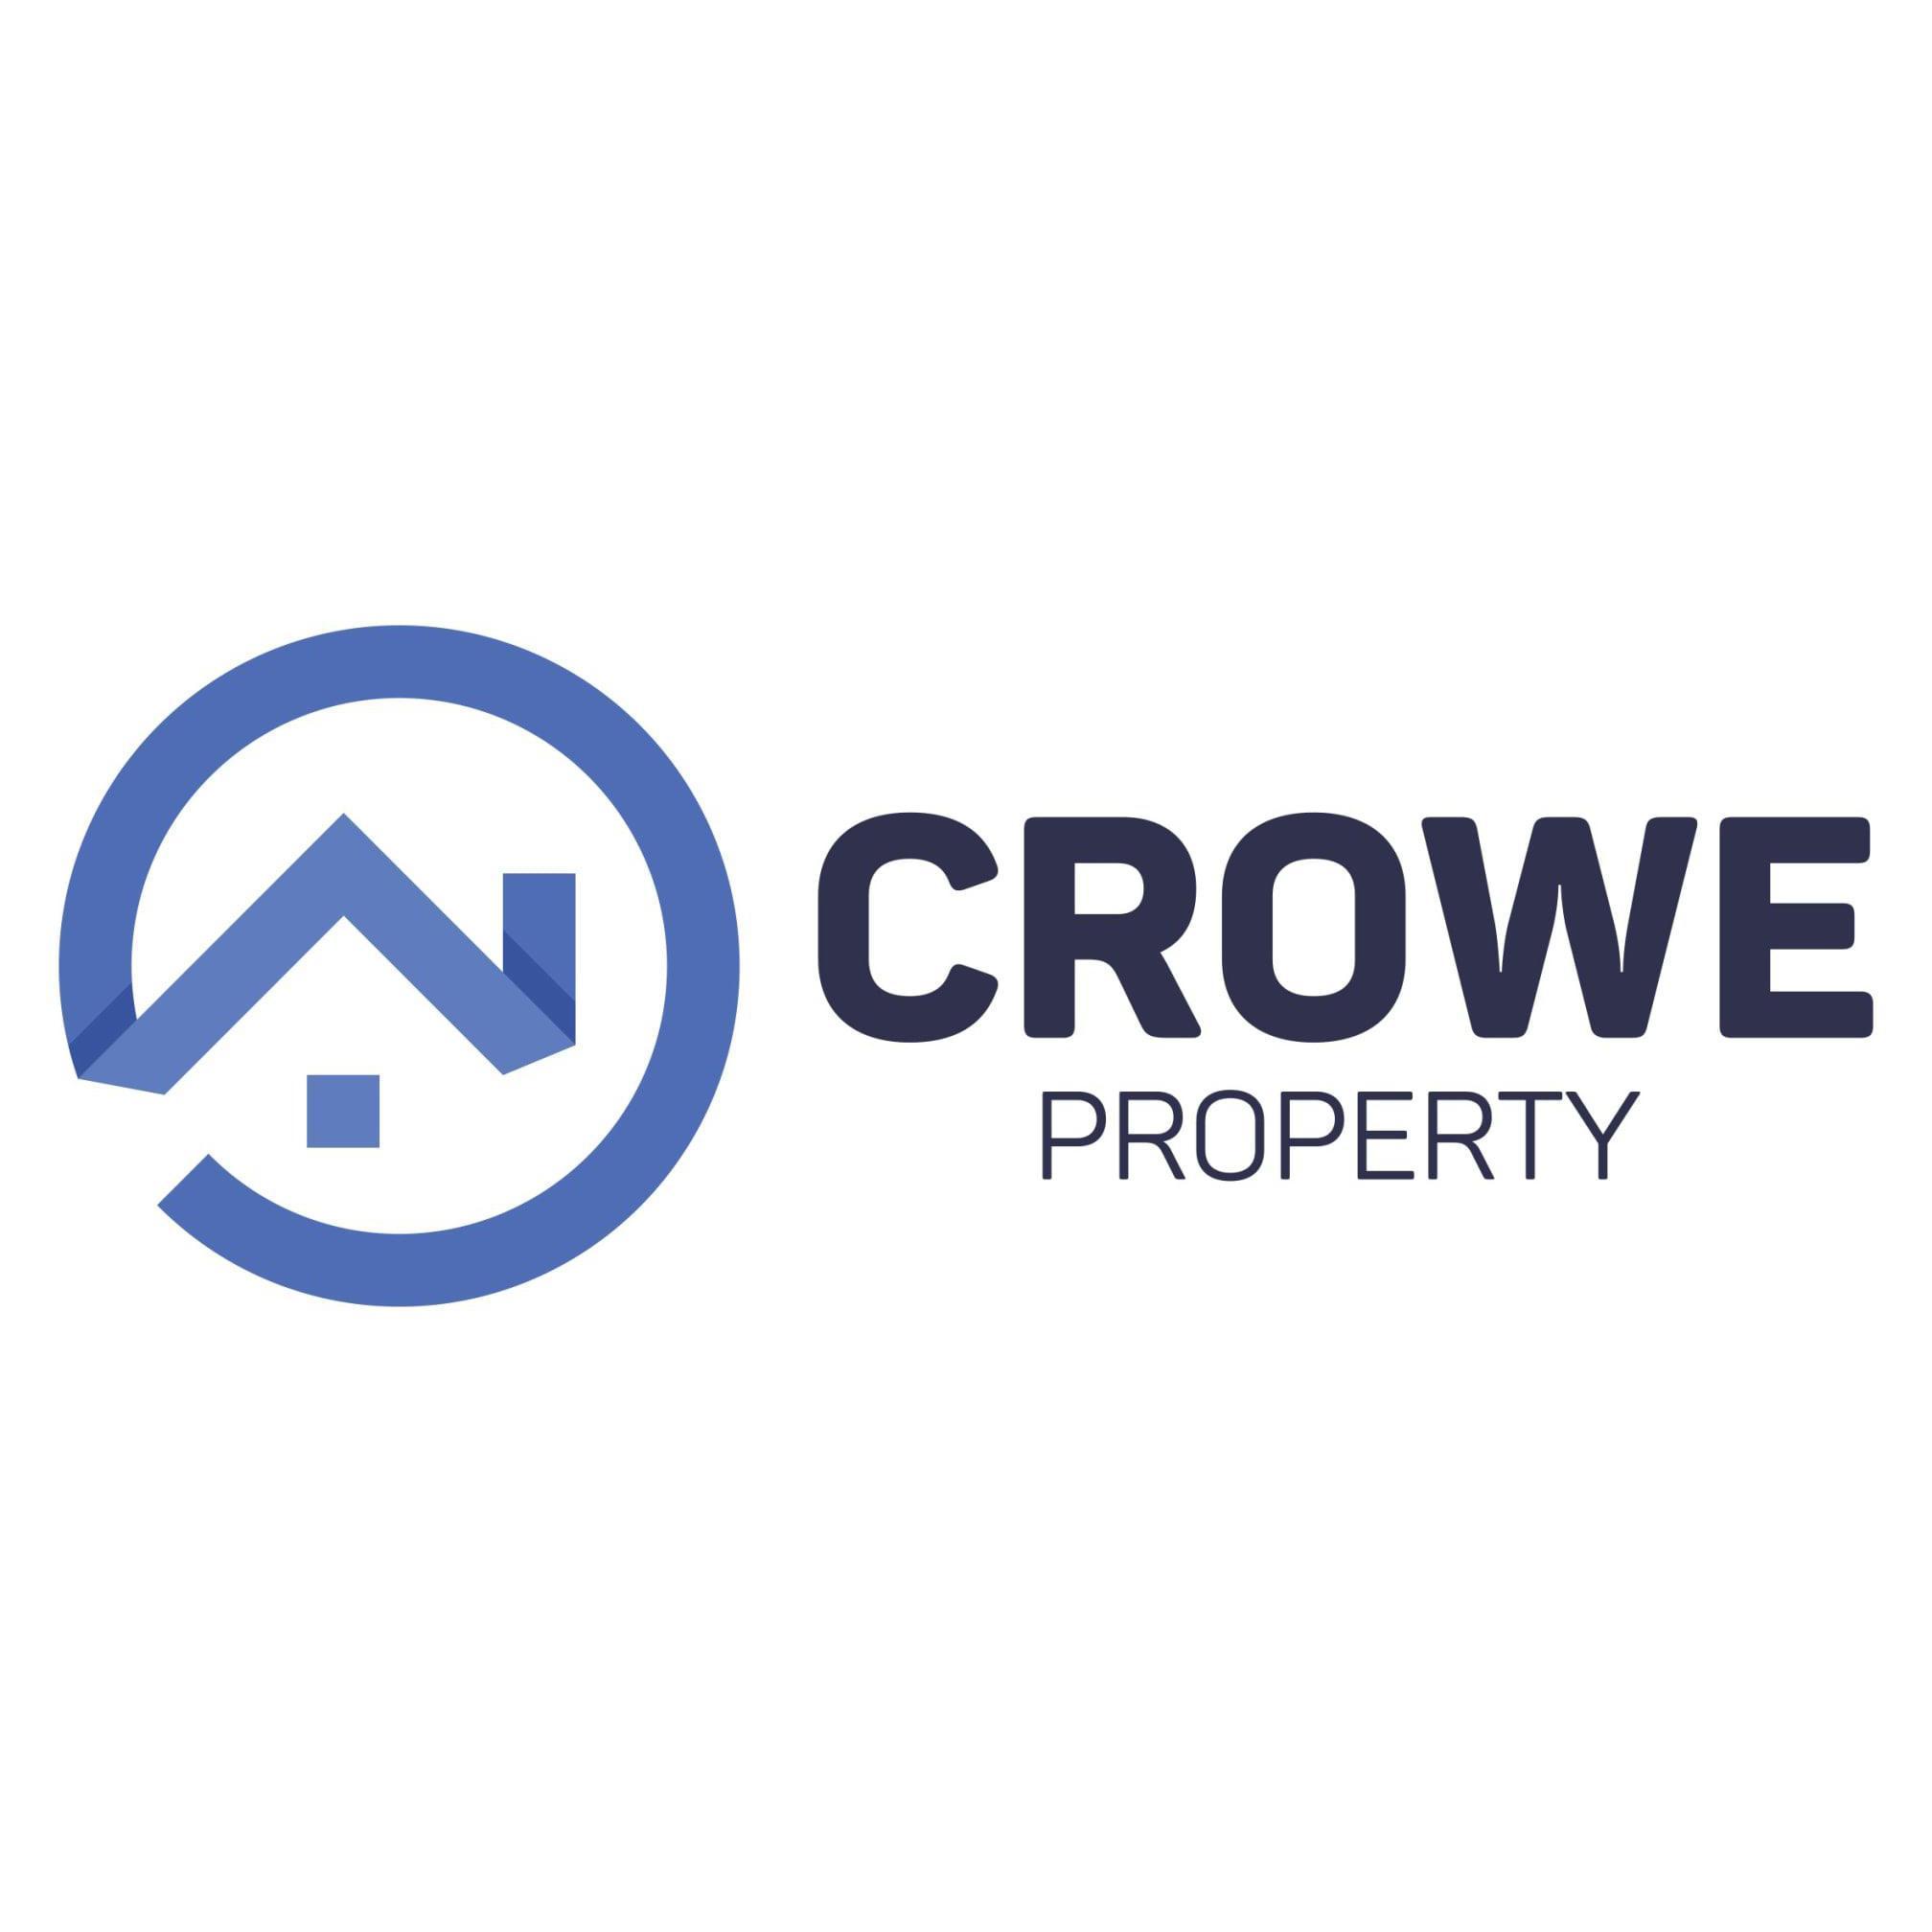 Crowe Property - Rushden, Northamptonshire NN10 0QU - 01933 322014 | ShowMeLocal.com